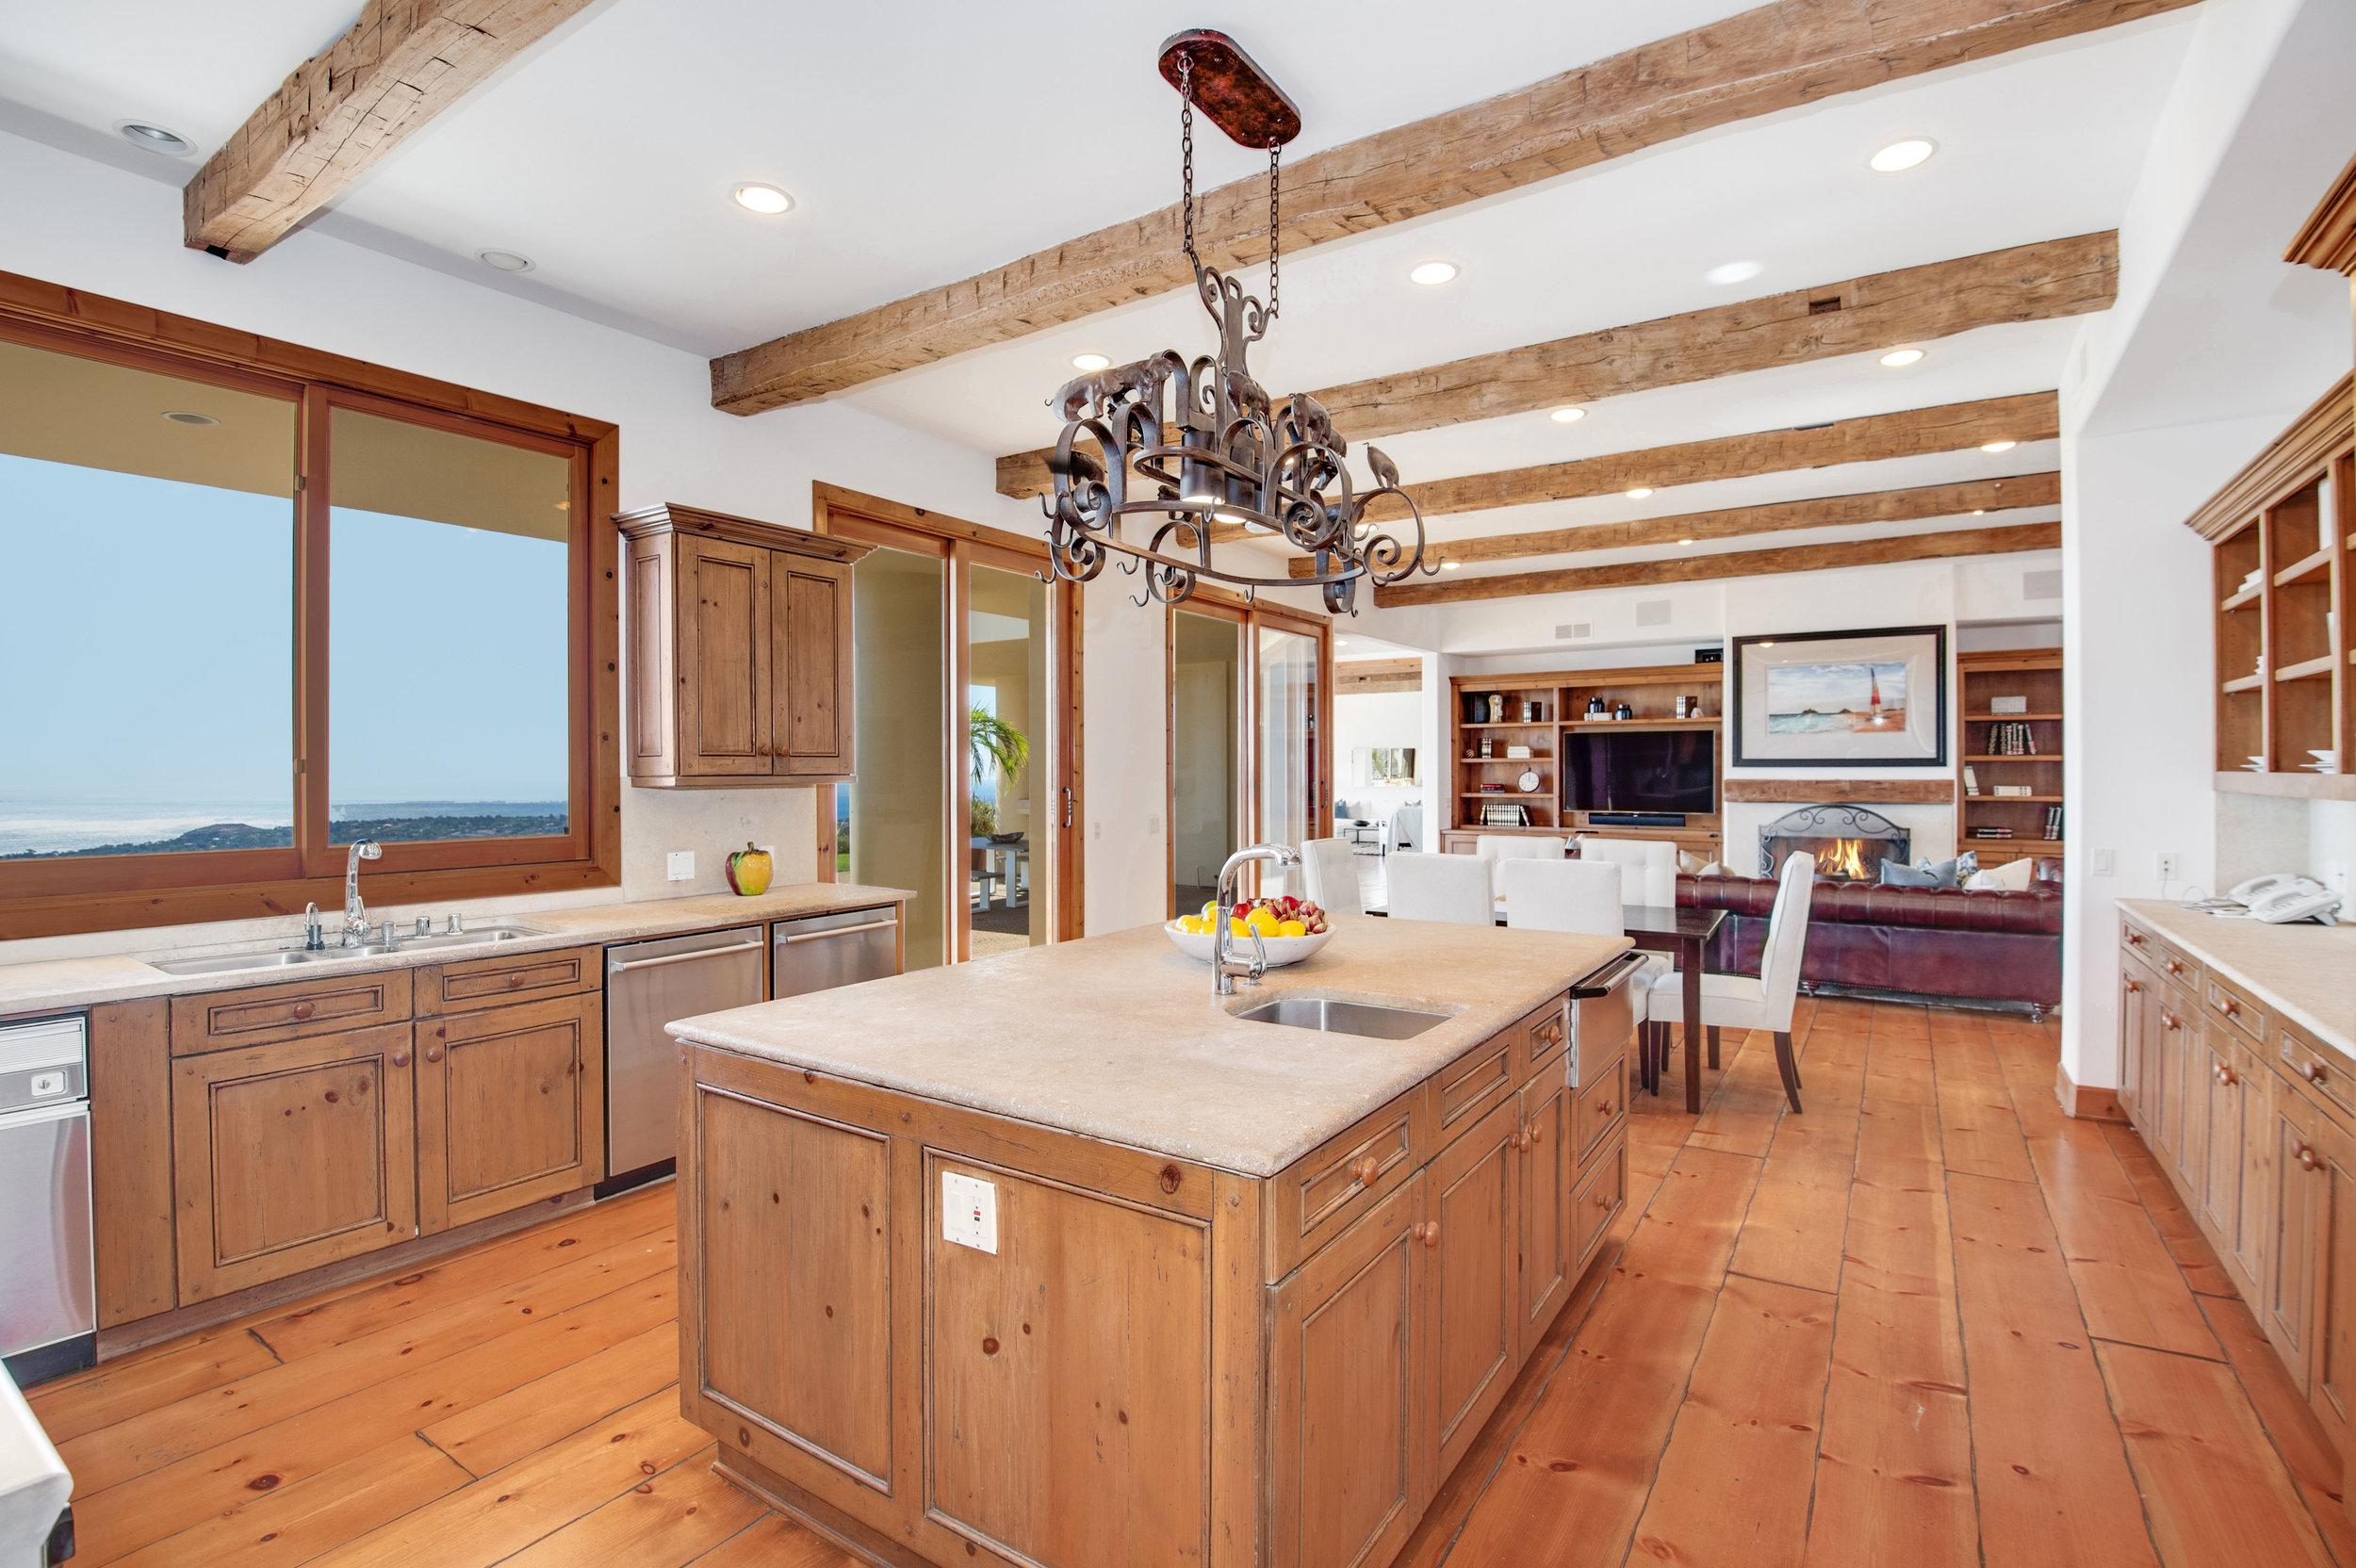 006 Kitchen 27475 Latigo Bay View Drive For Sale Lease The Malibu Life Team Luxury Real Estate.jpg